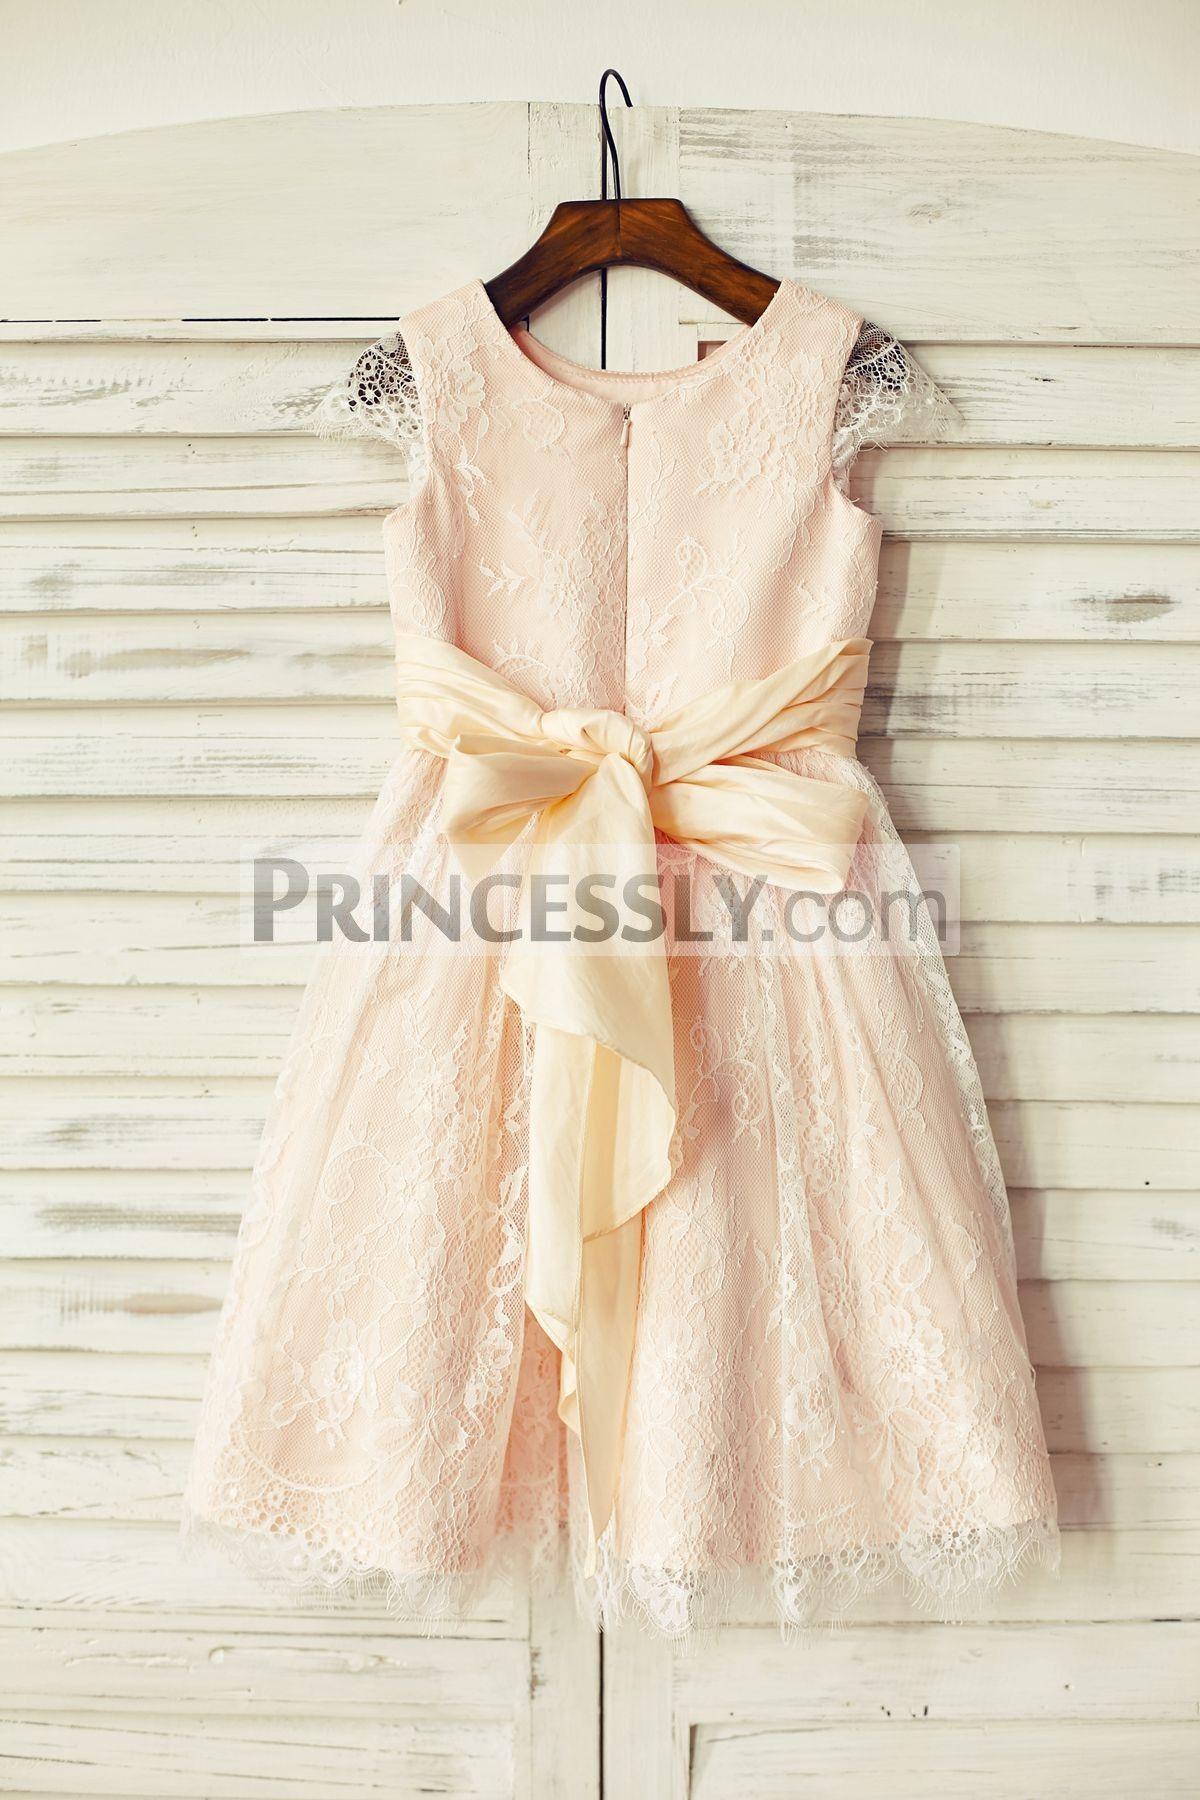 bc5bd512d90 Princessly.com-K1000190-Blush Pink Satin Ivory Lace Cap Sleeves Flower Girl  Dresses with peach sash-31